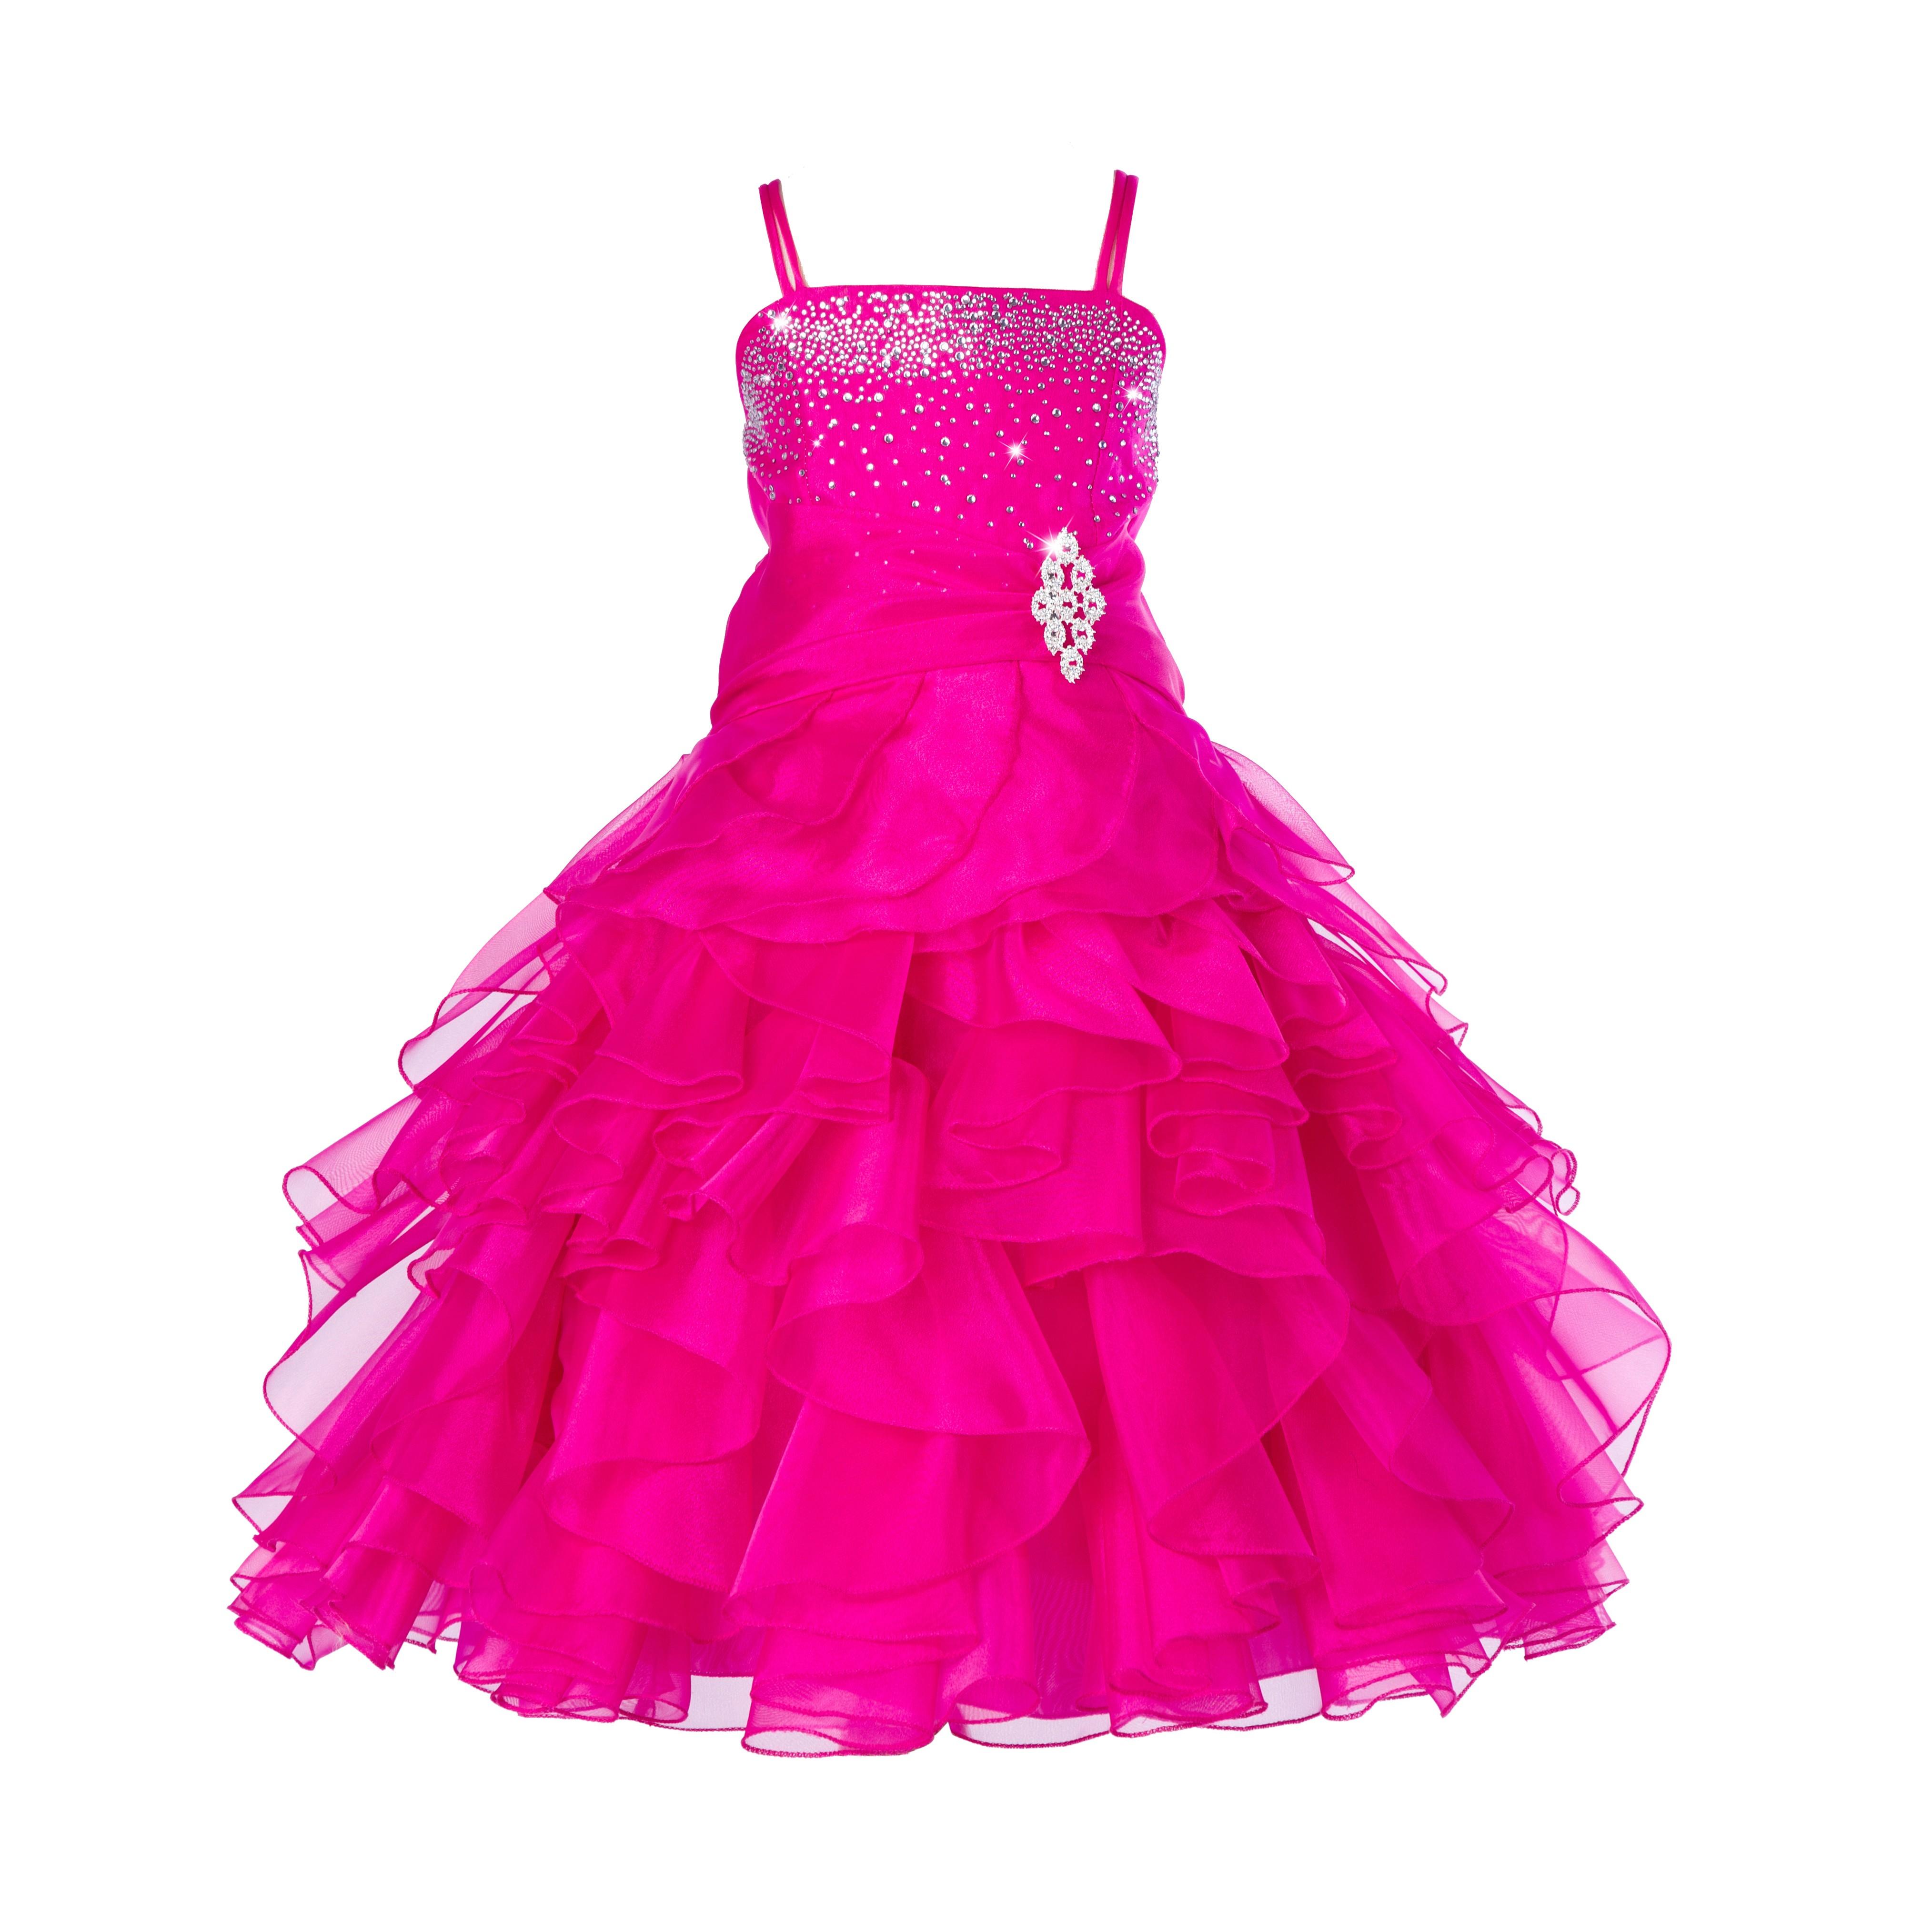 Fuchsia Rhinestone Organza Layers Flower Girl Dress Elegant Stunning 164S